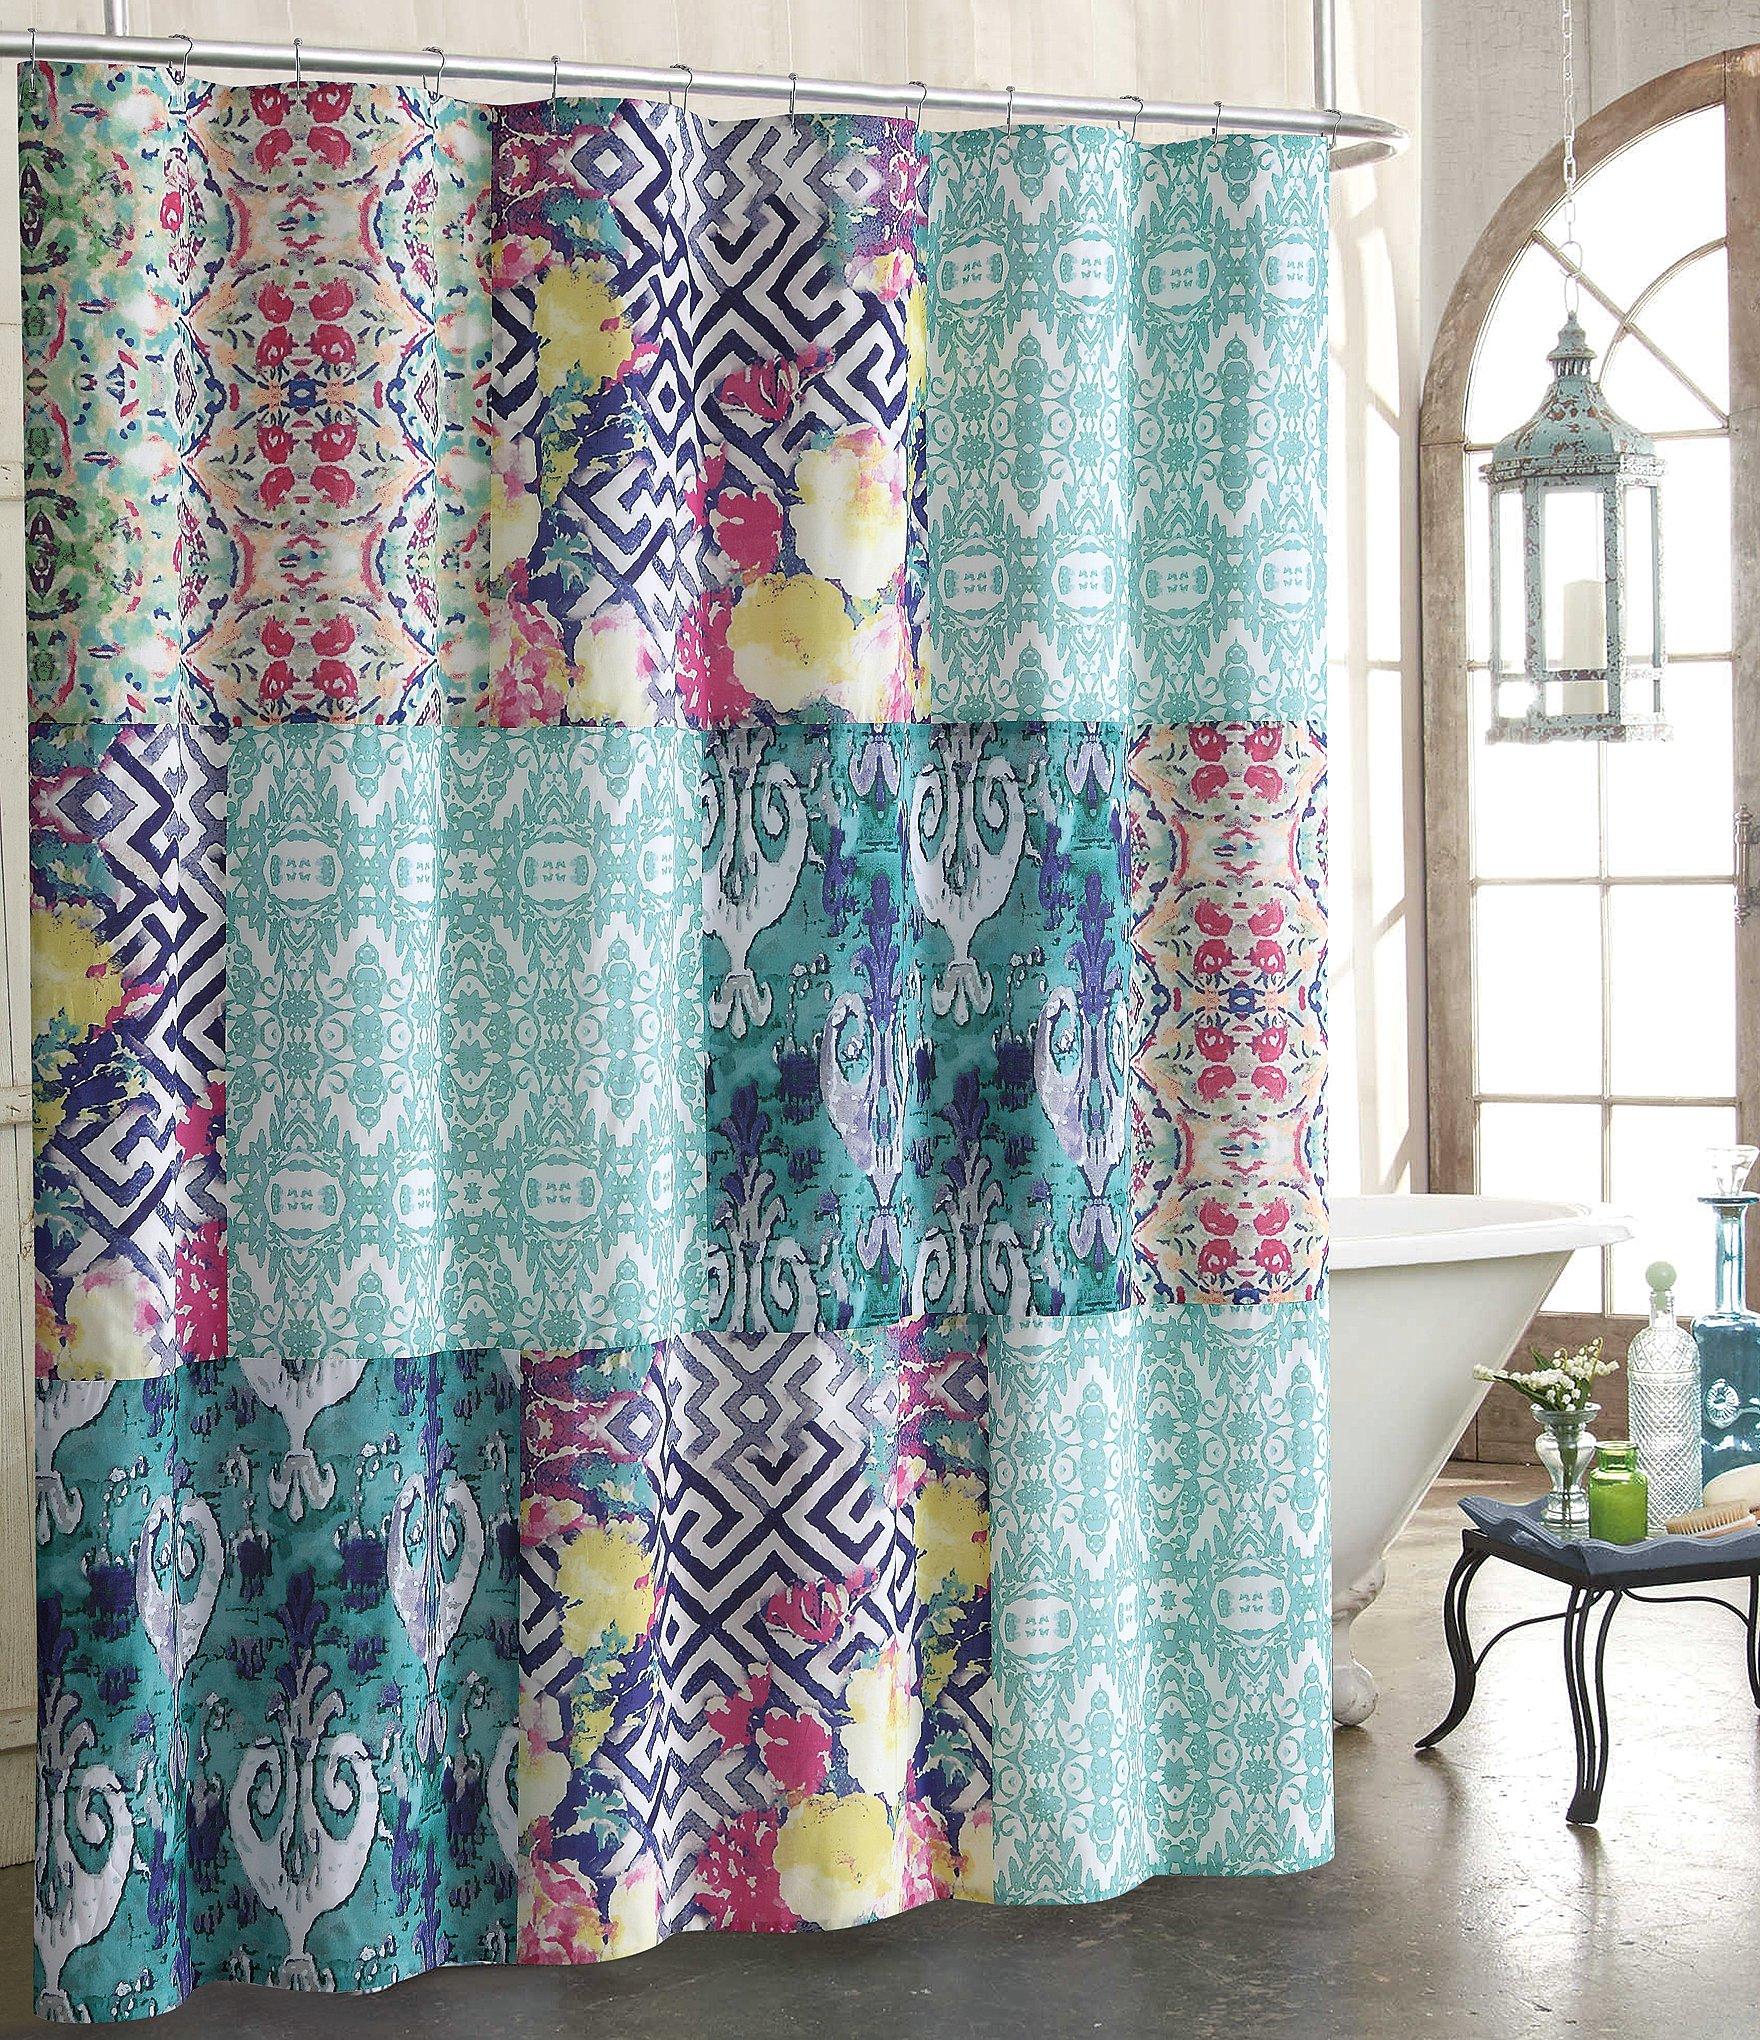 Solid teal shower curtain - Solid Teal Shower Curtain